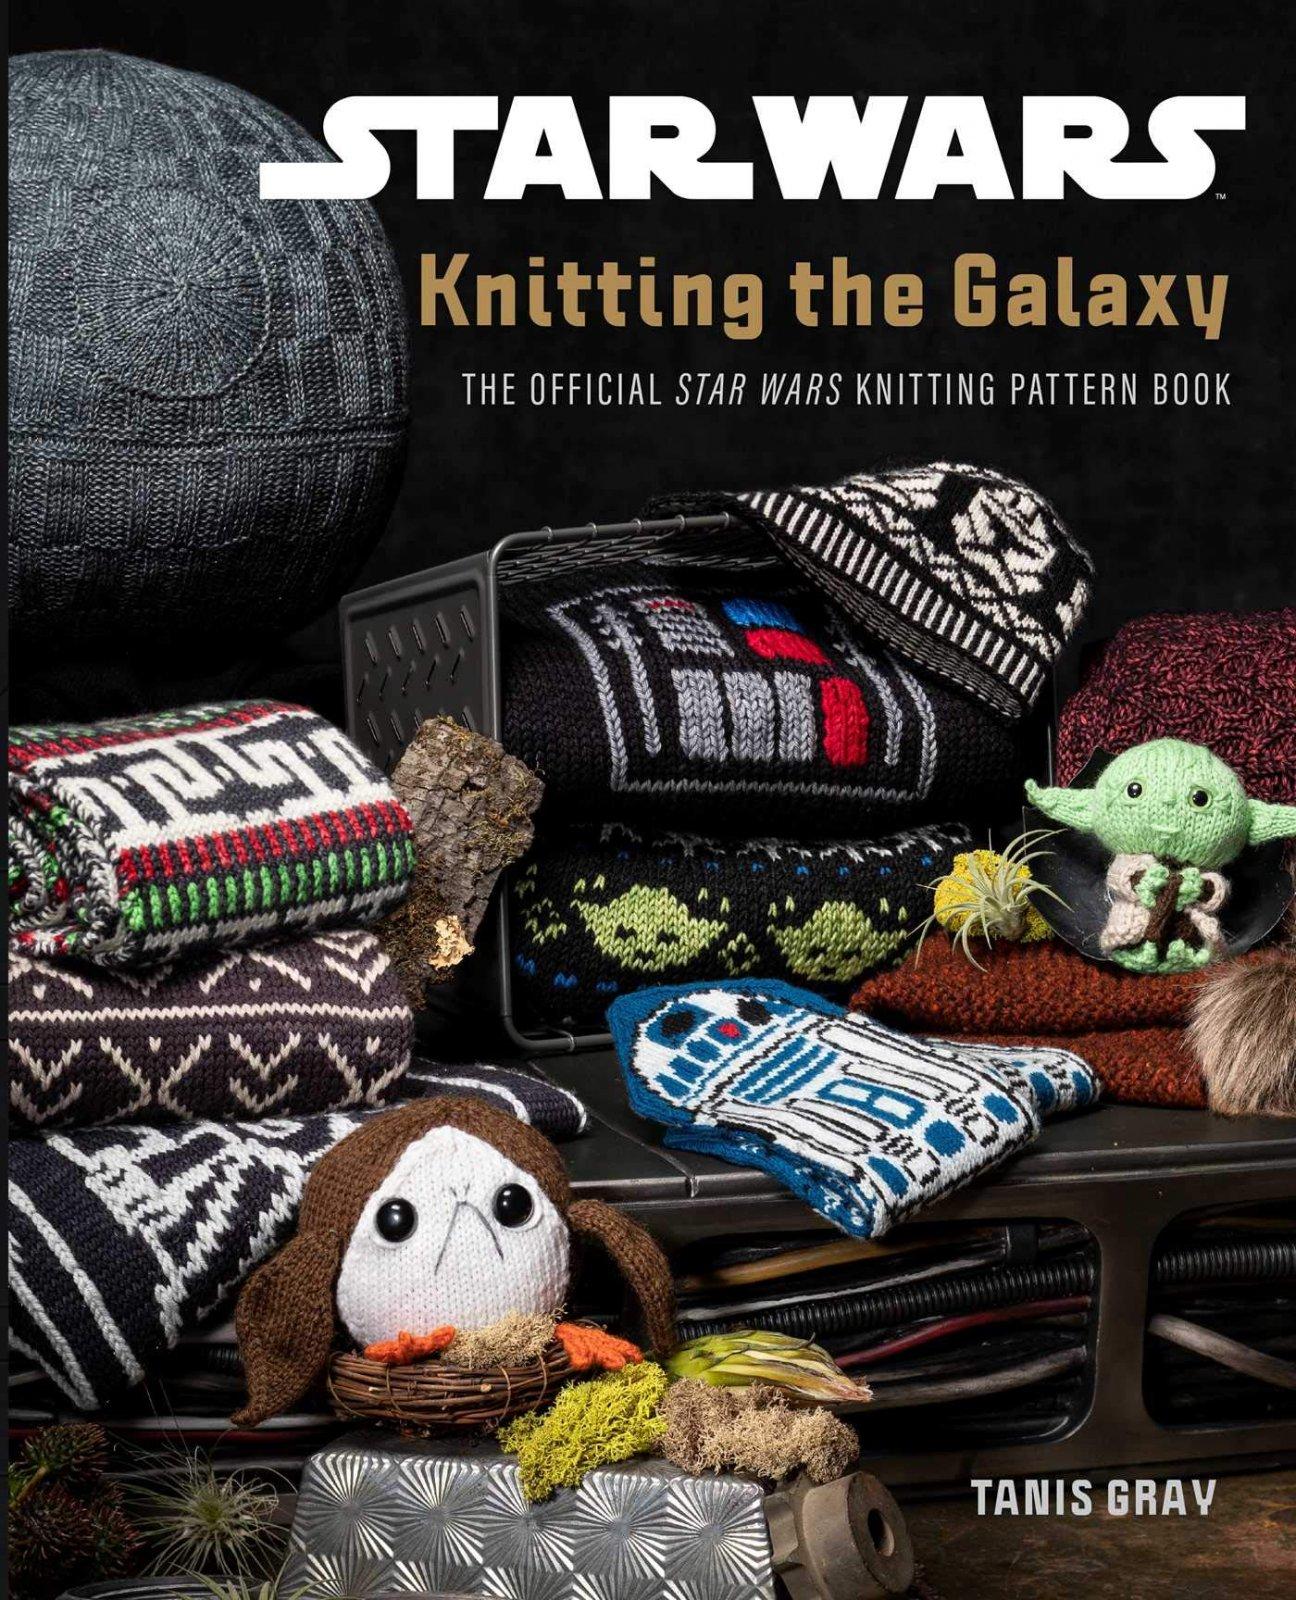 Star Wars:  Knitting the Galaxy